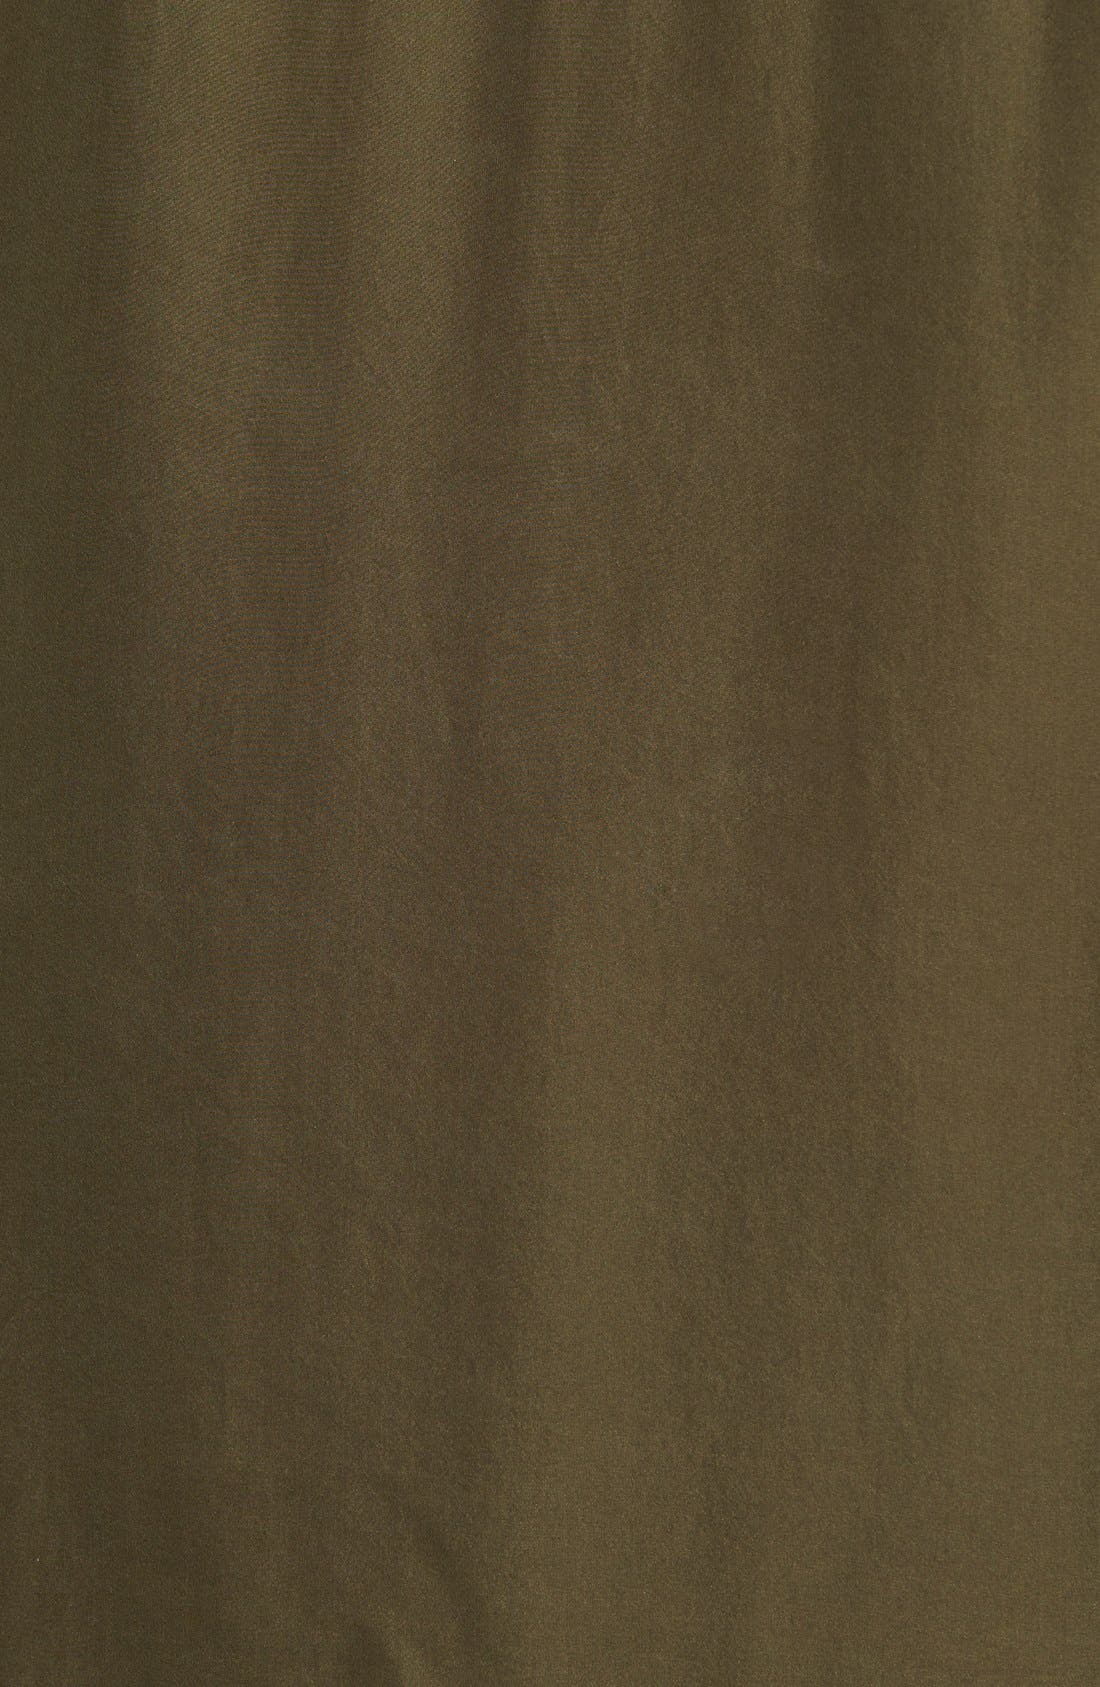 Alternate Image 3  - J Brand Ready-To-Wear 'Edie' Silk Shirt